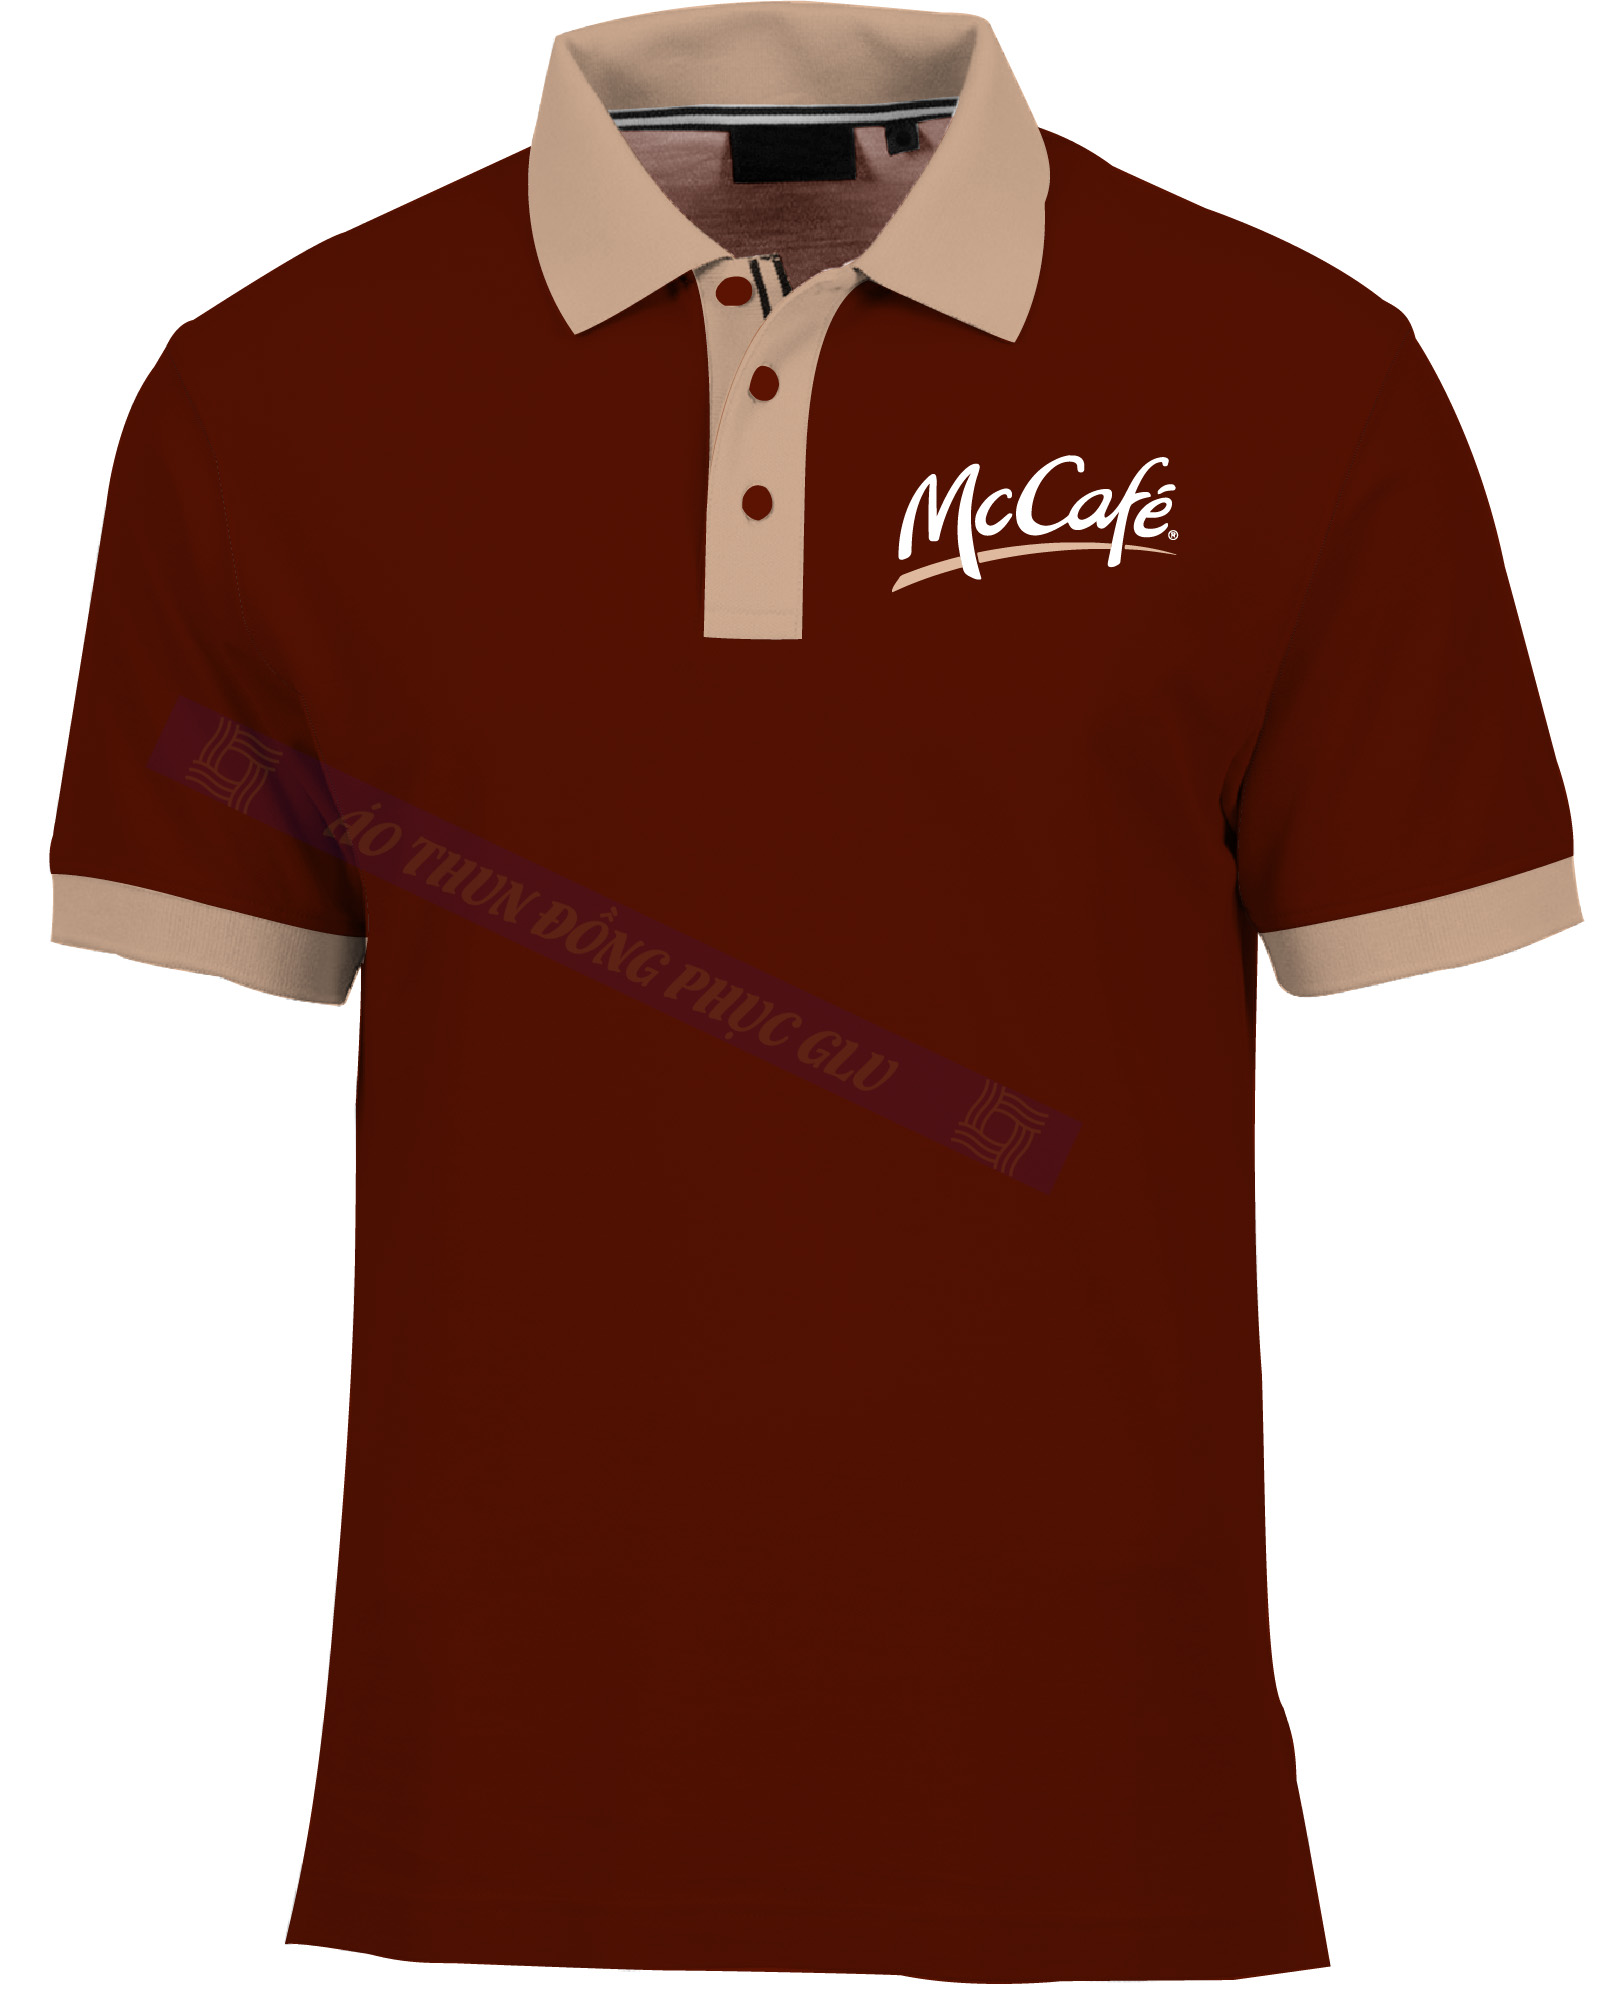 AO THUN MC CAFE AT160 áo thun đồng phục có cổ